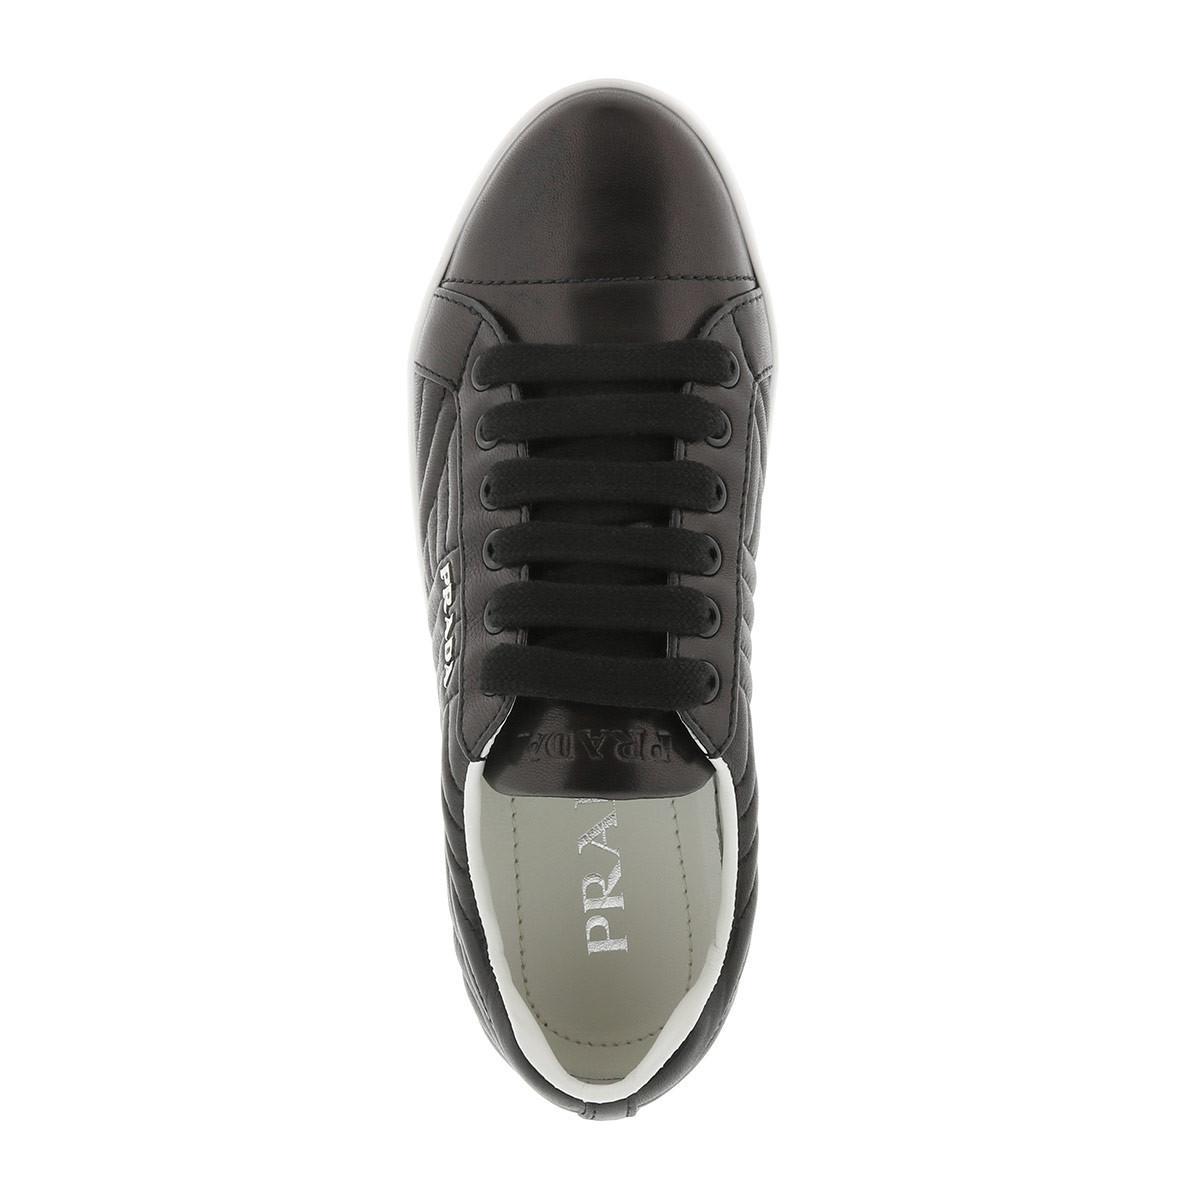 25df188a9e72b8 Prada Sneakers Matelassé W Logo Leather Nero/bianco in Black - Lyst